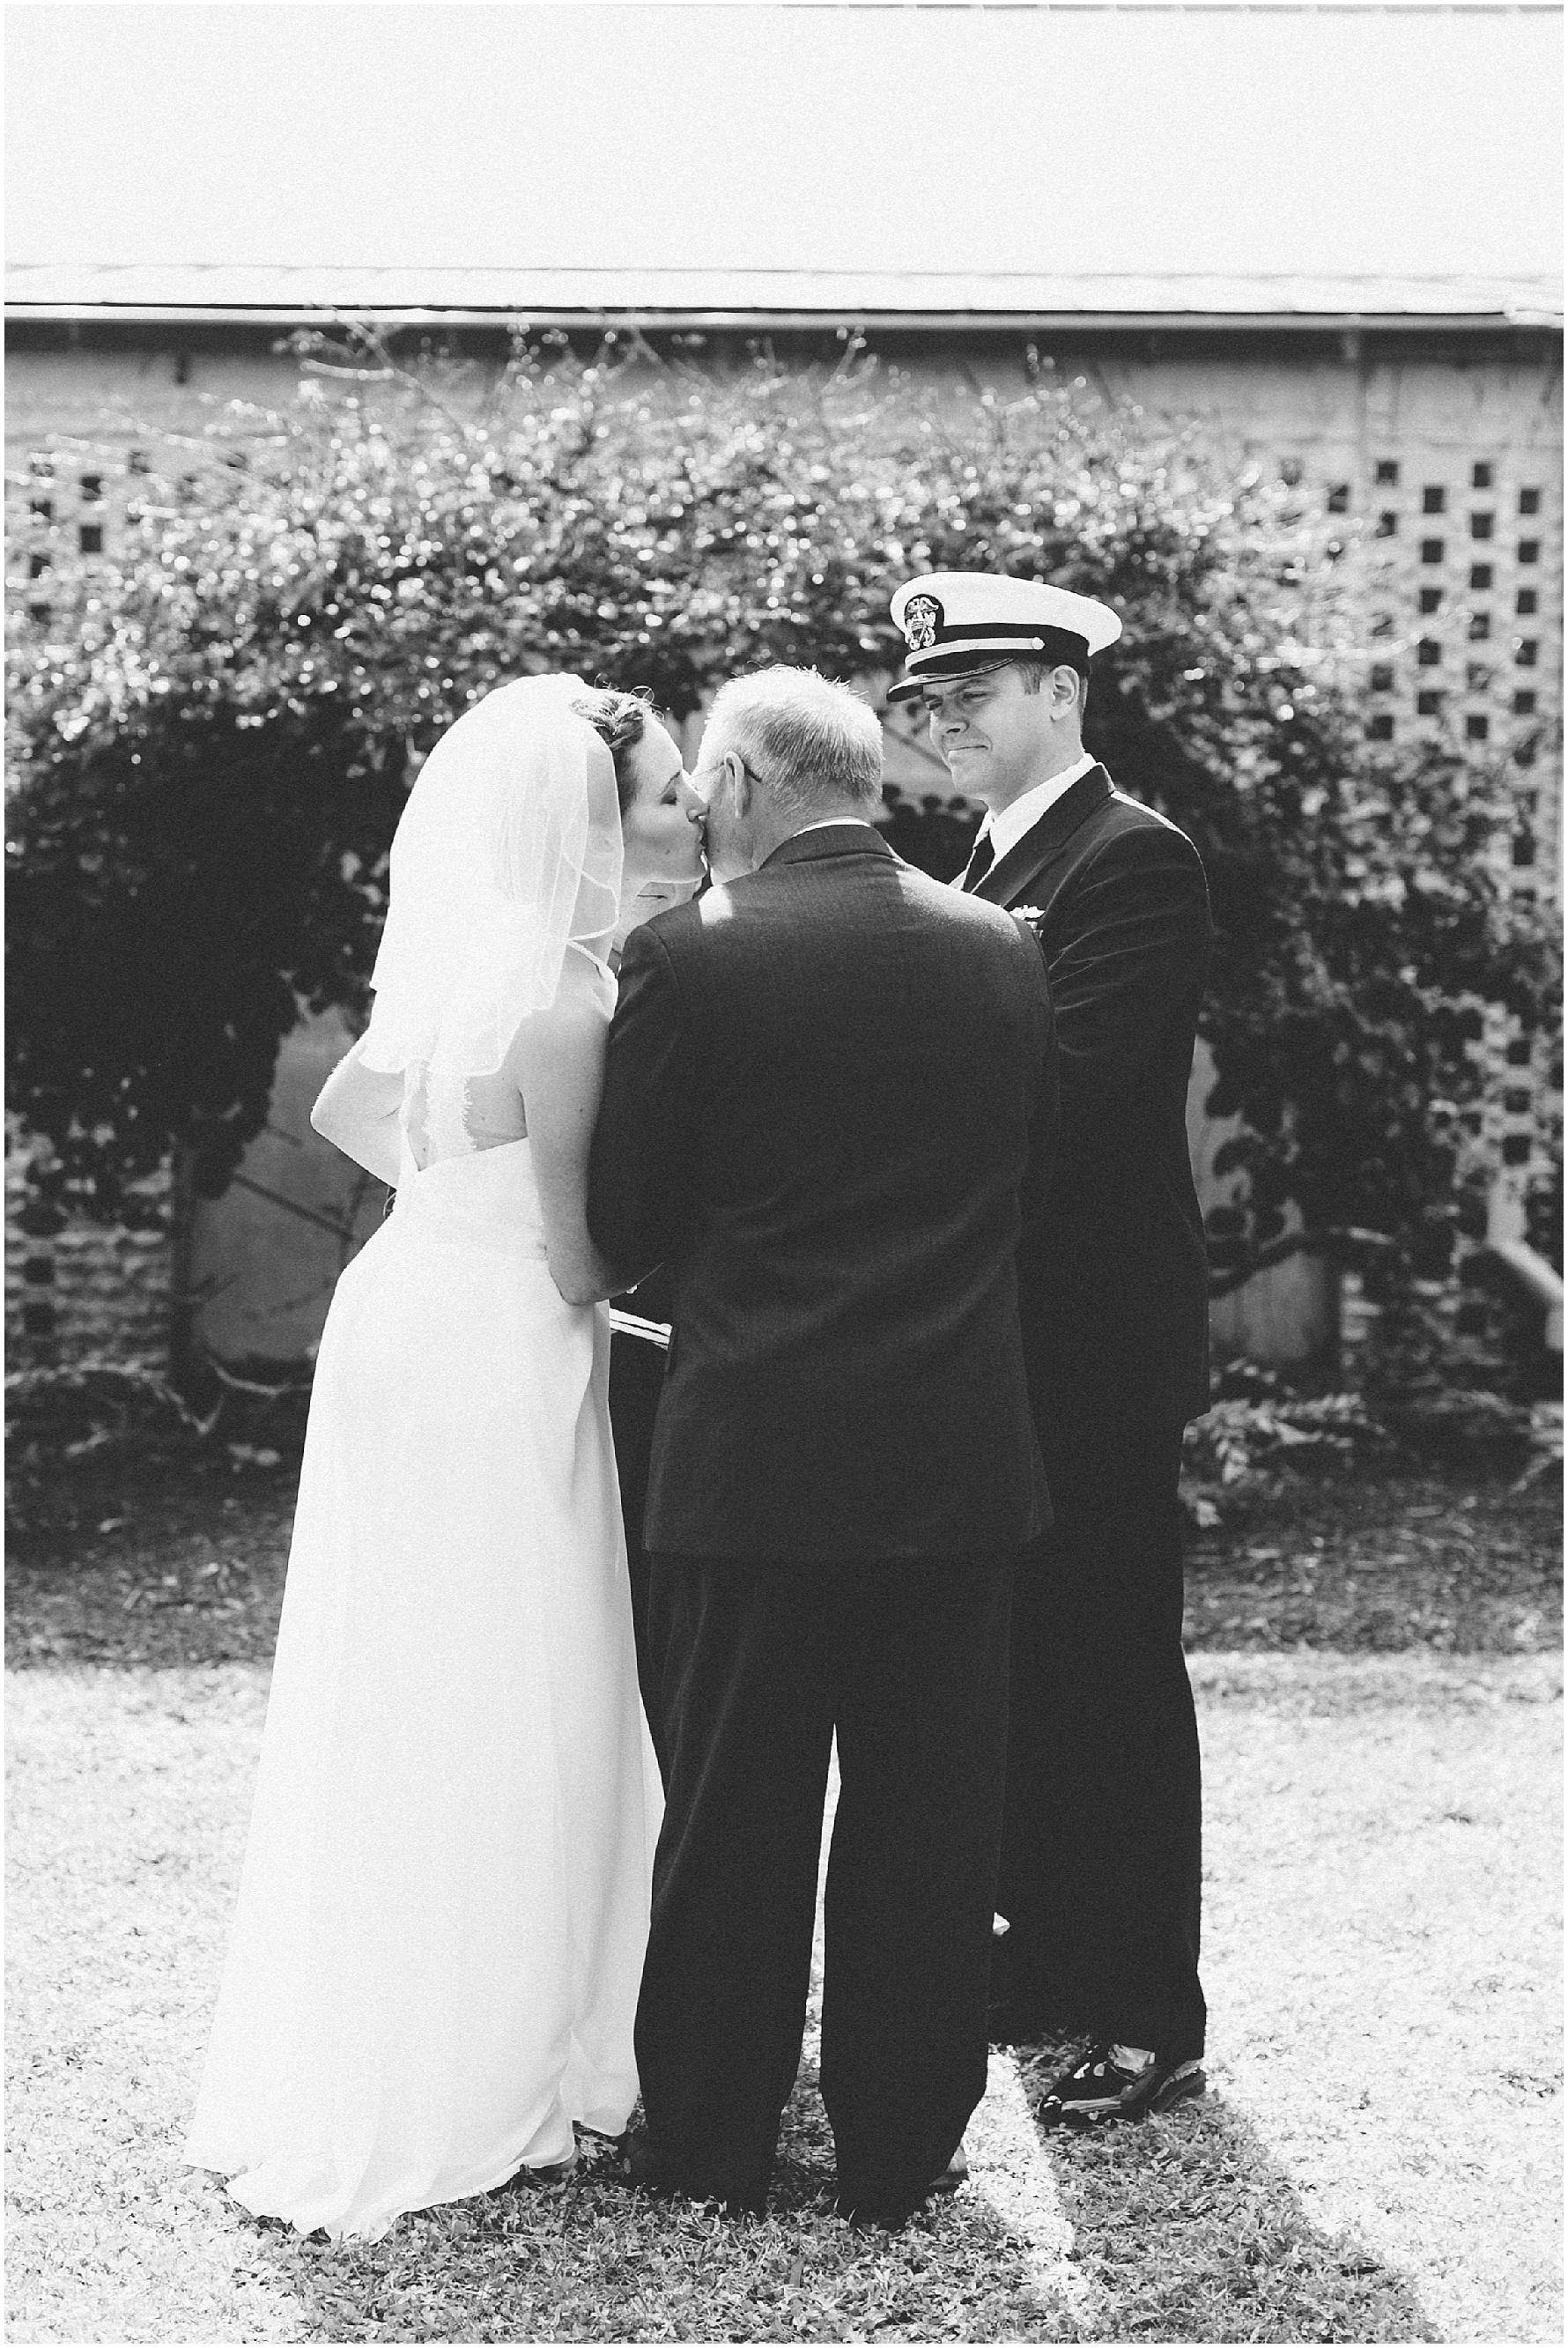 Mariner's Museum Wedding, afternoon wedding ceremony